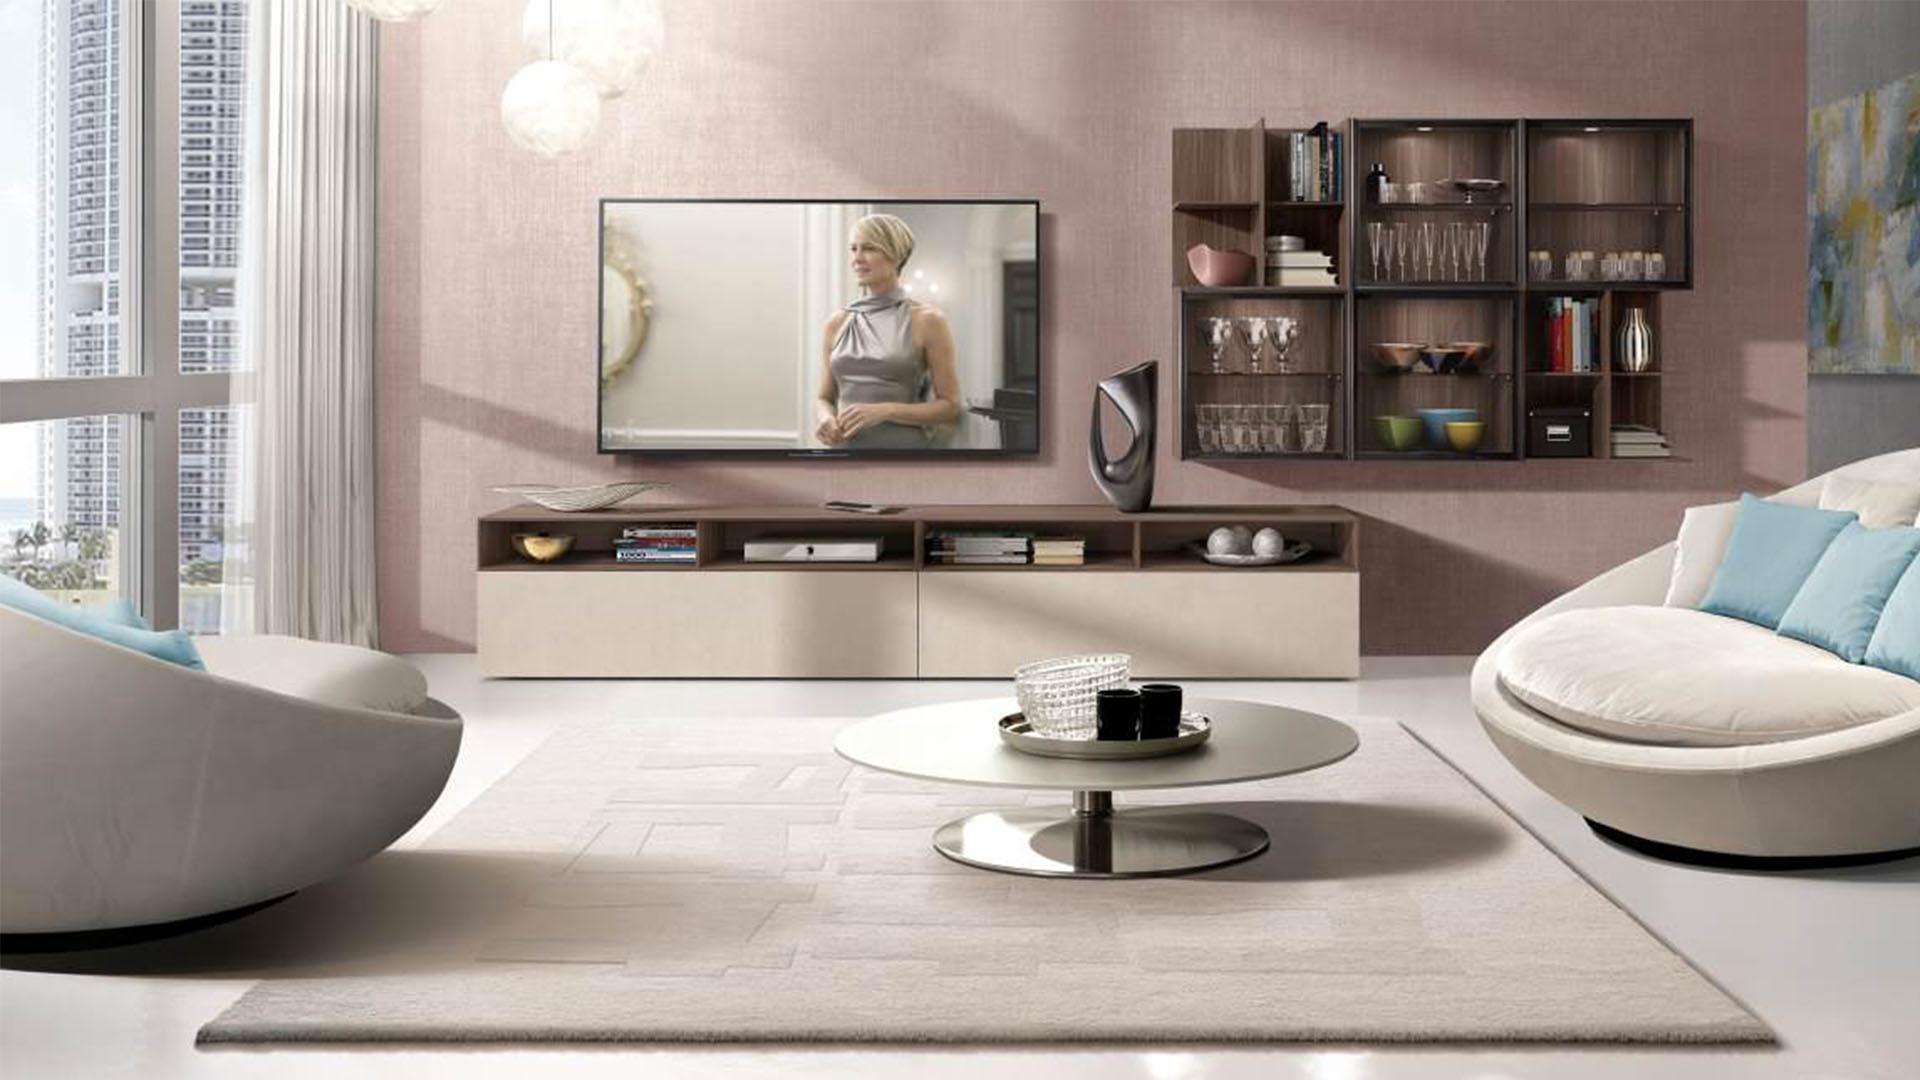 complements accessories kitchen